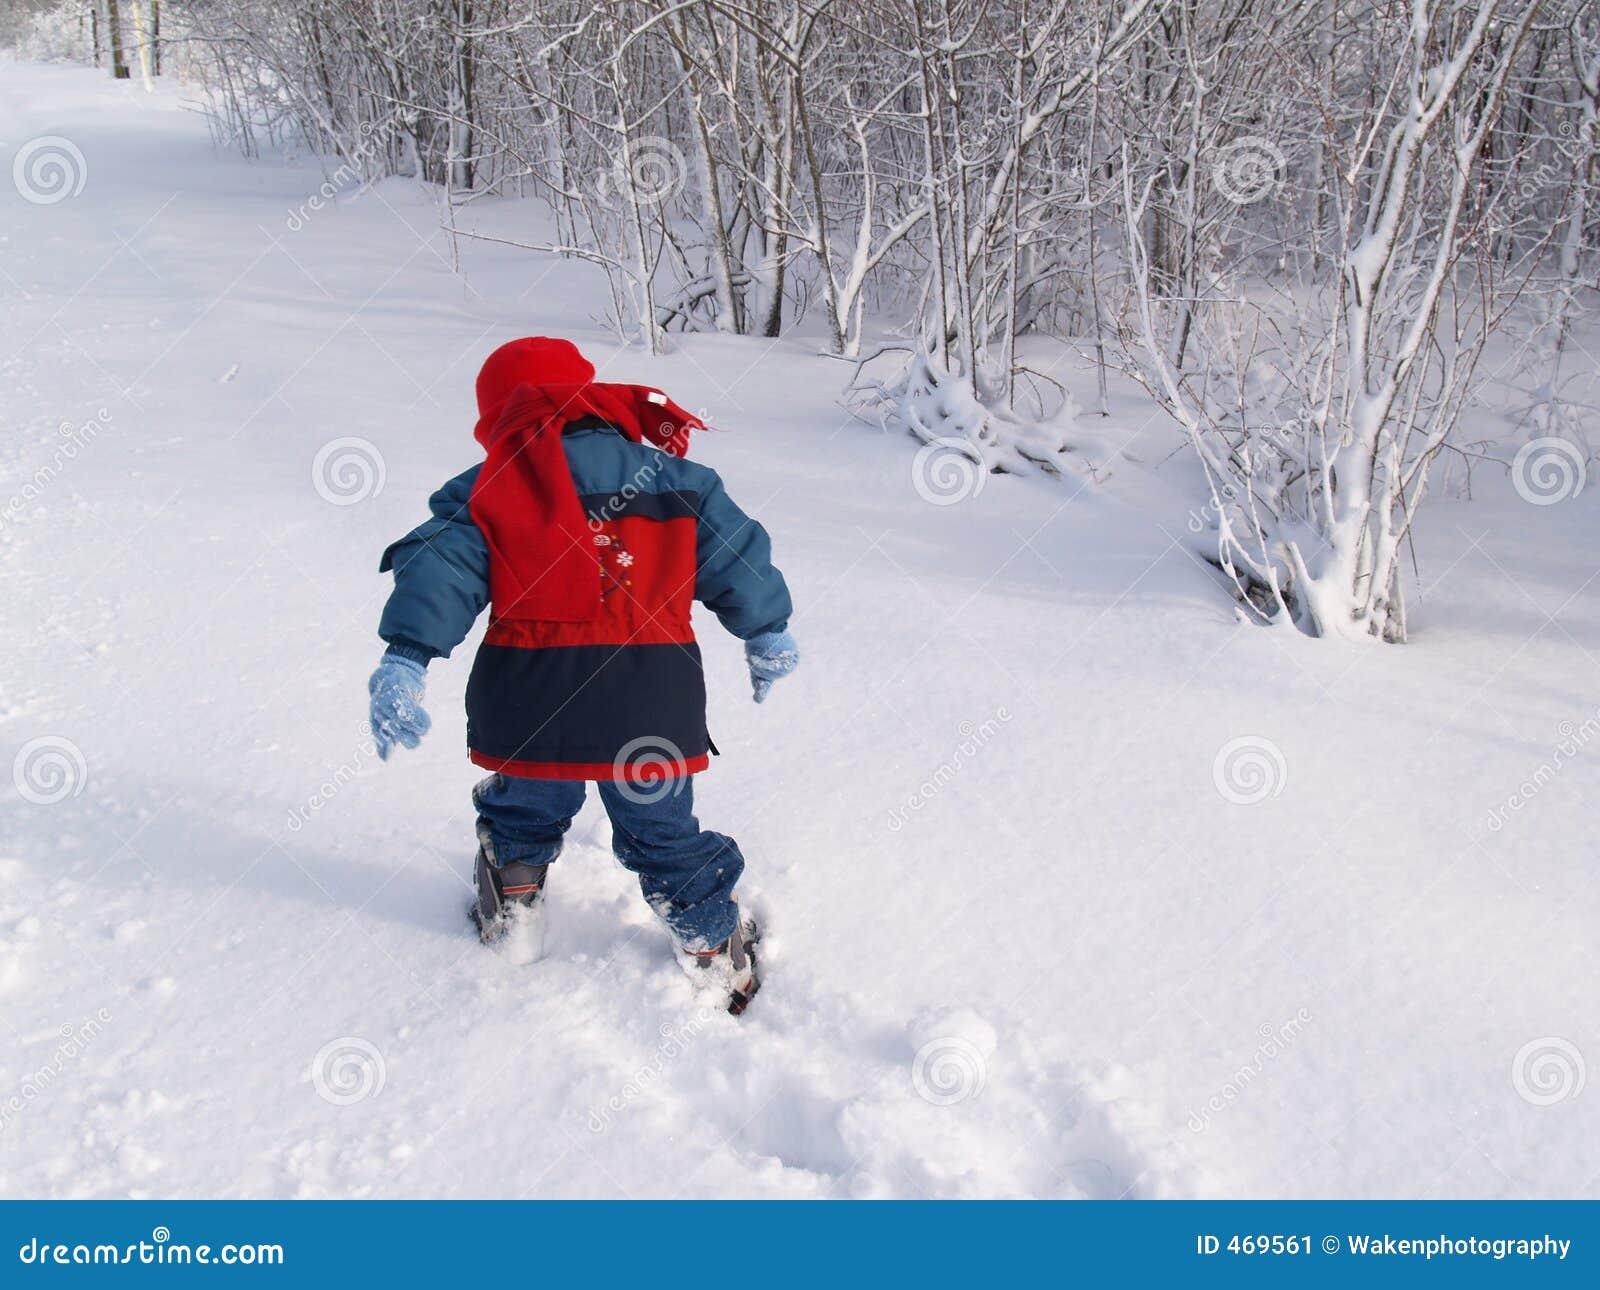 Snow Venture